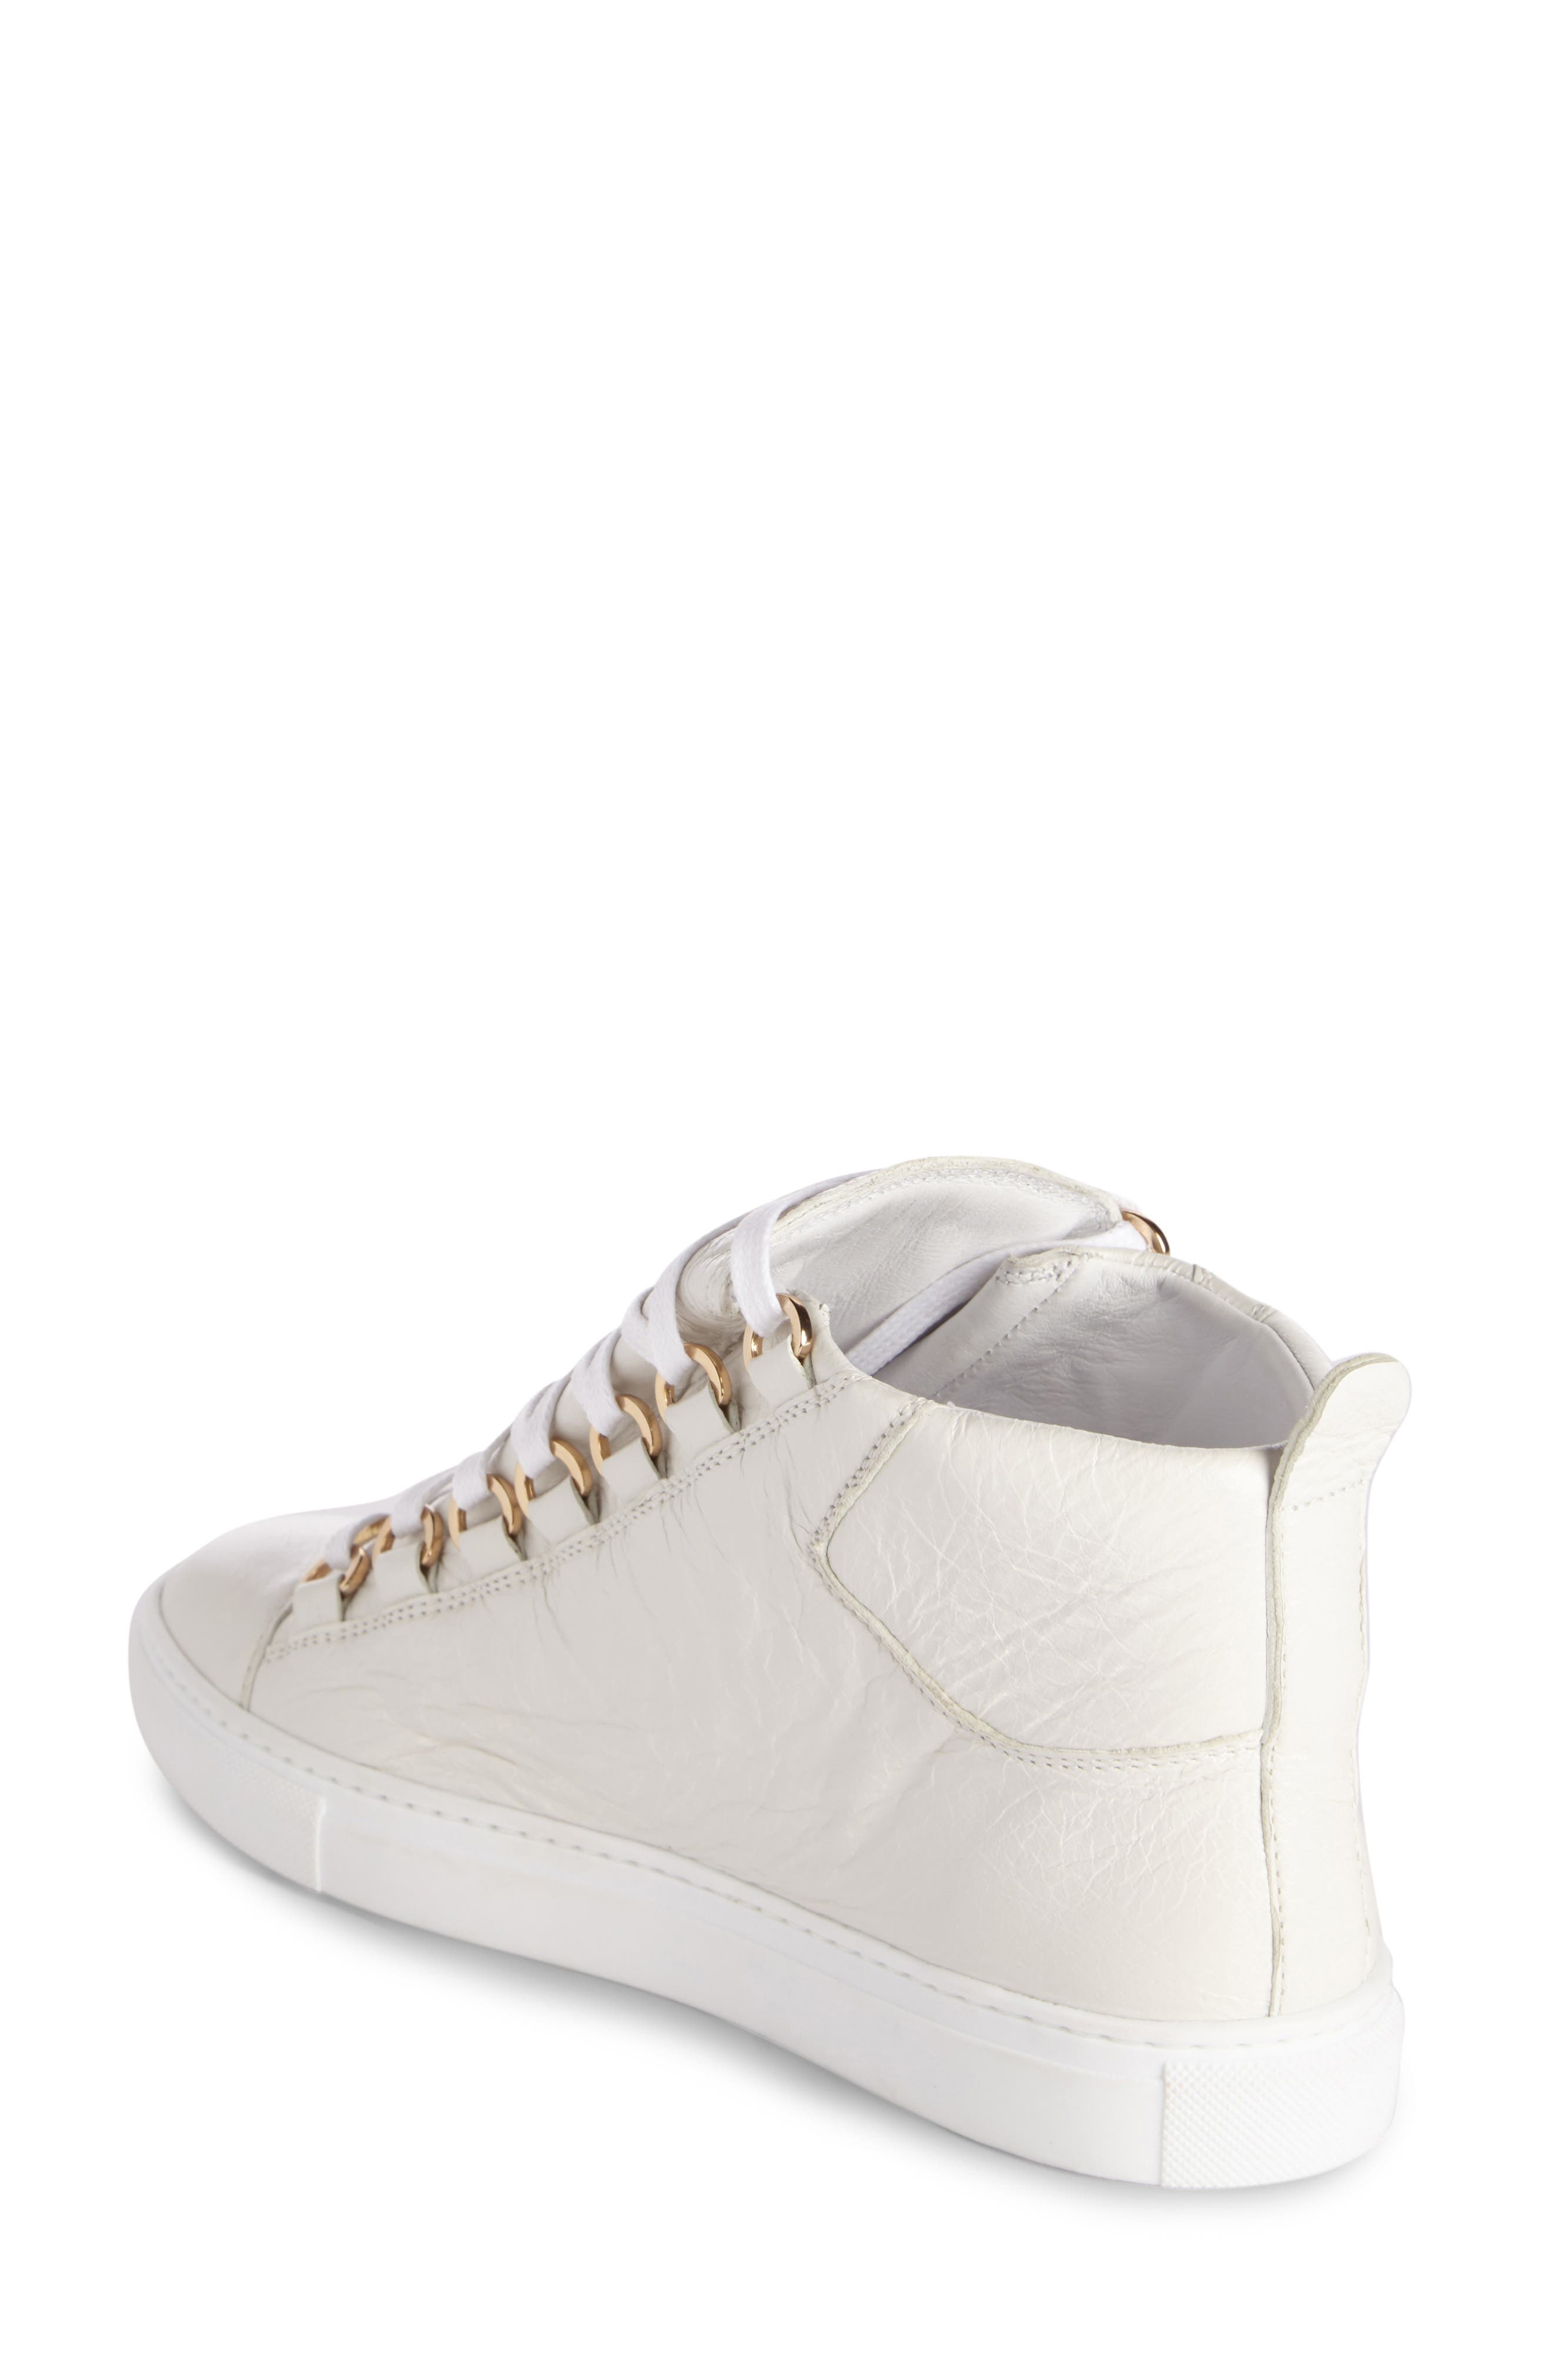 High Top Sneaker,                             Alternate thumbnail 10, color,